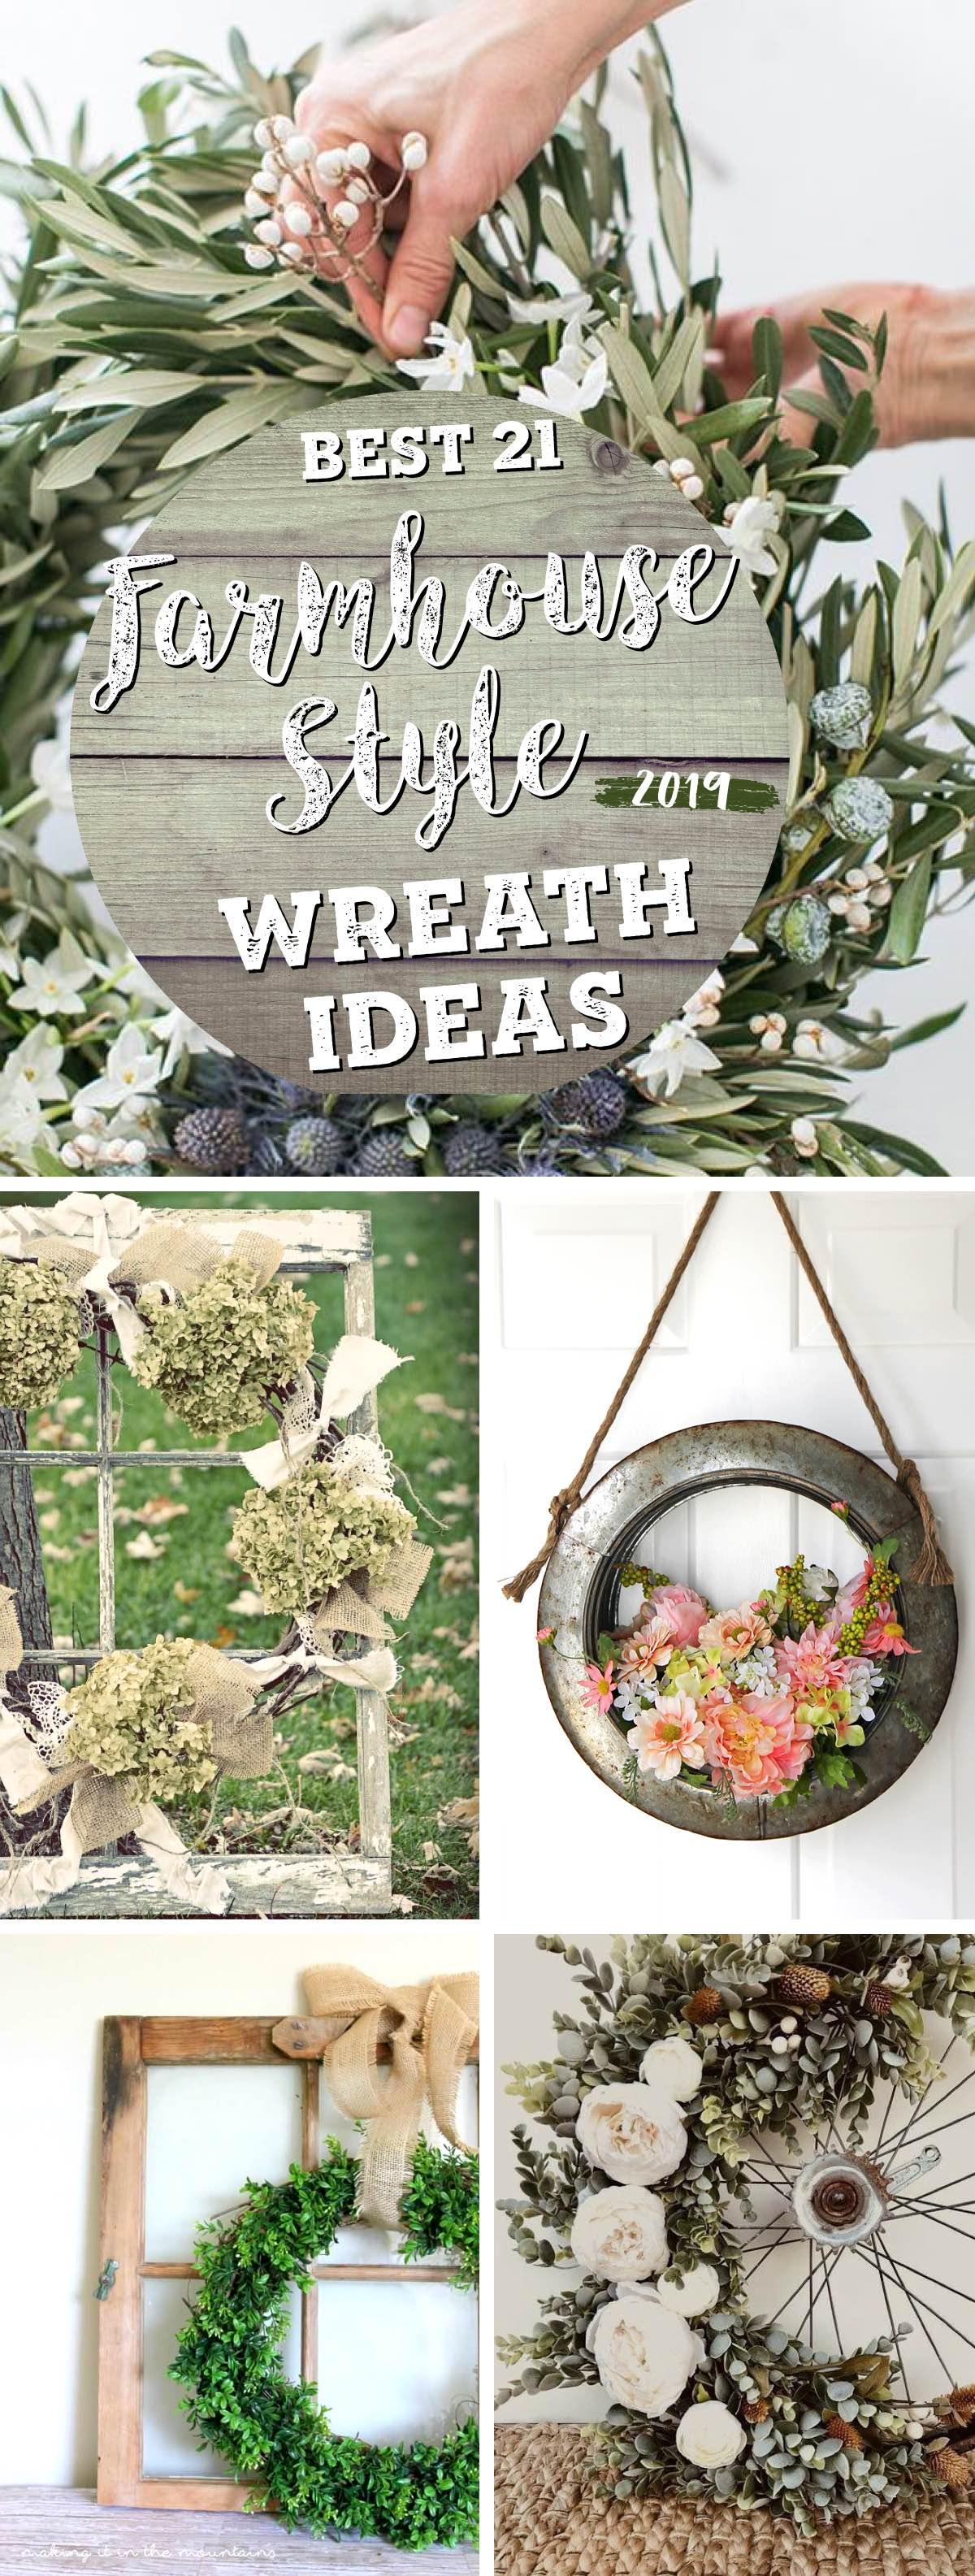 Farmhouse Inspired Wreath